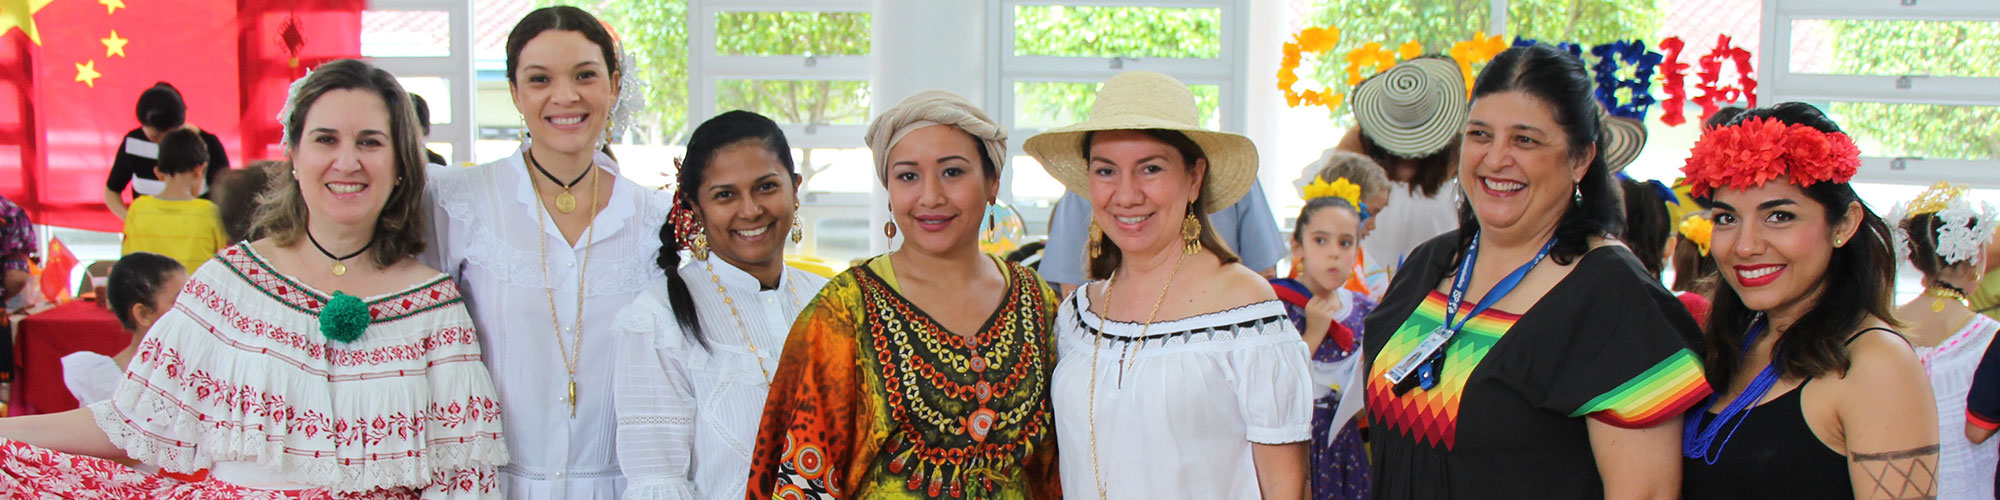 Staff at International Day